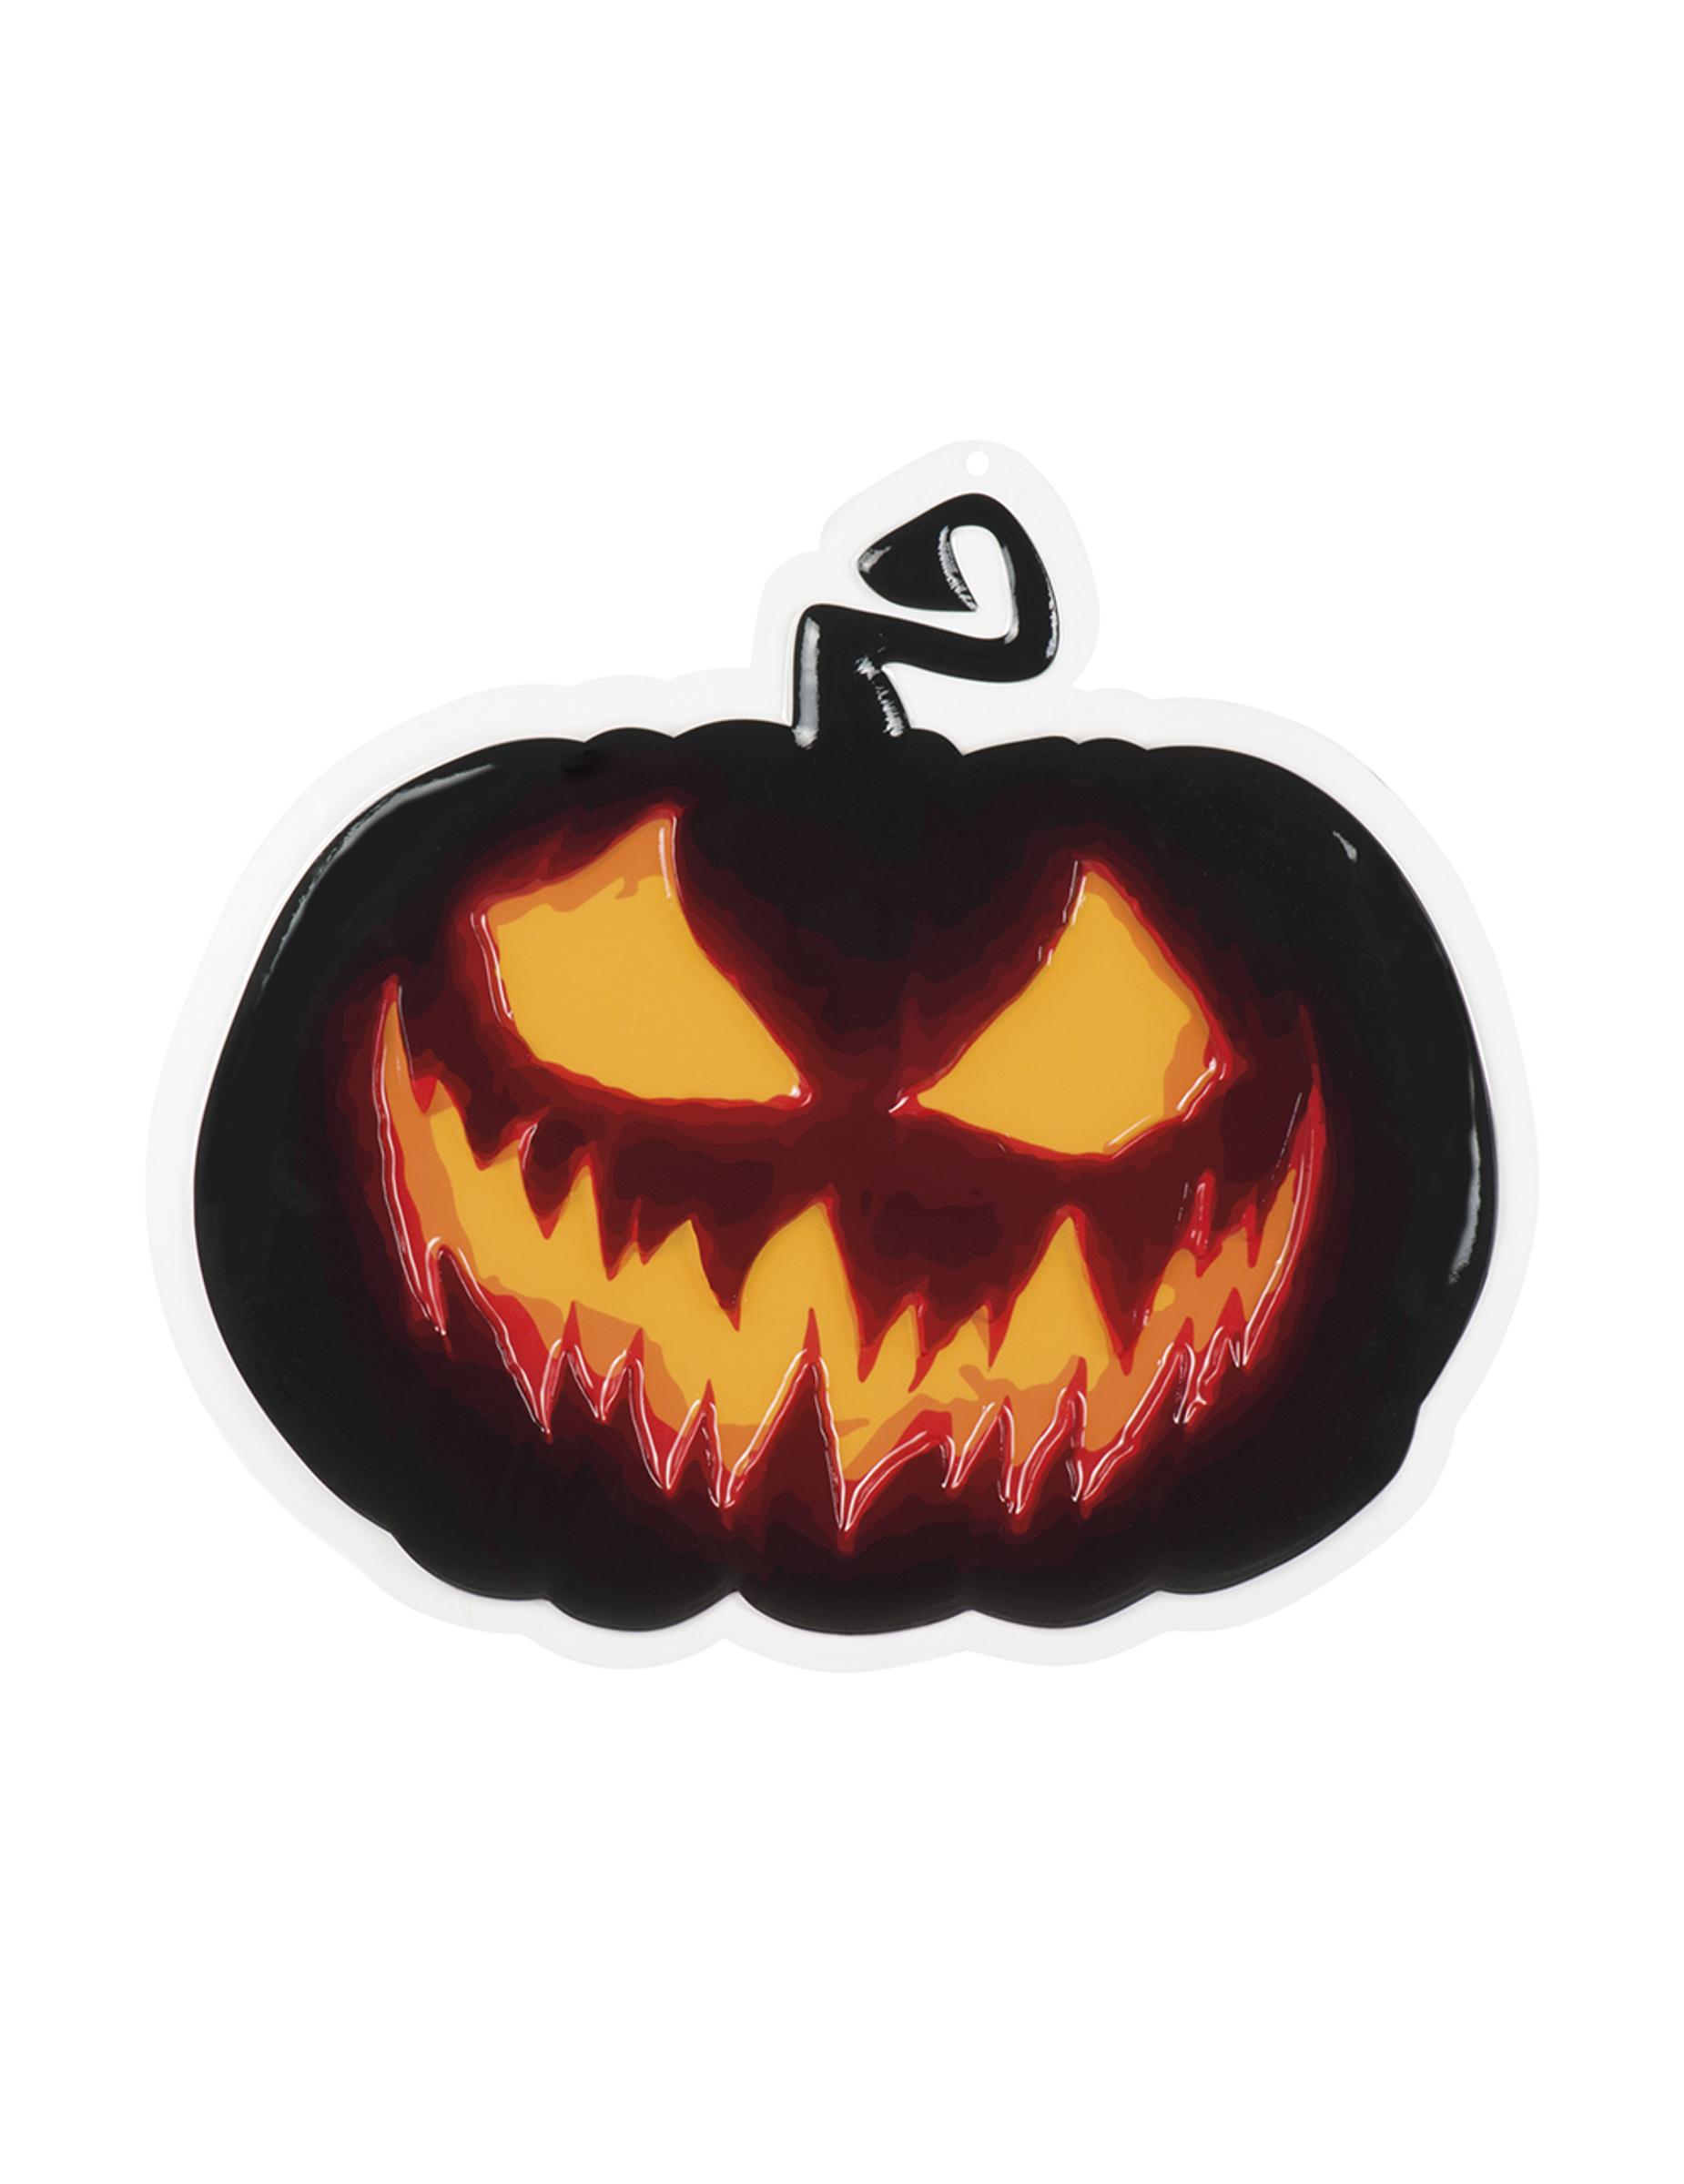 Zucche Di Halloween Terrificanti.Decorazione Da Muro Zucca Terrificante 45 Cm